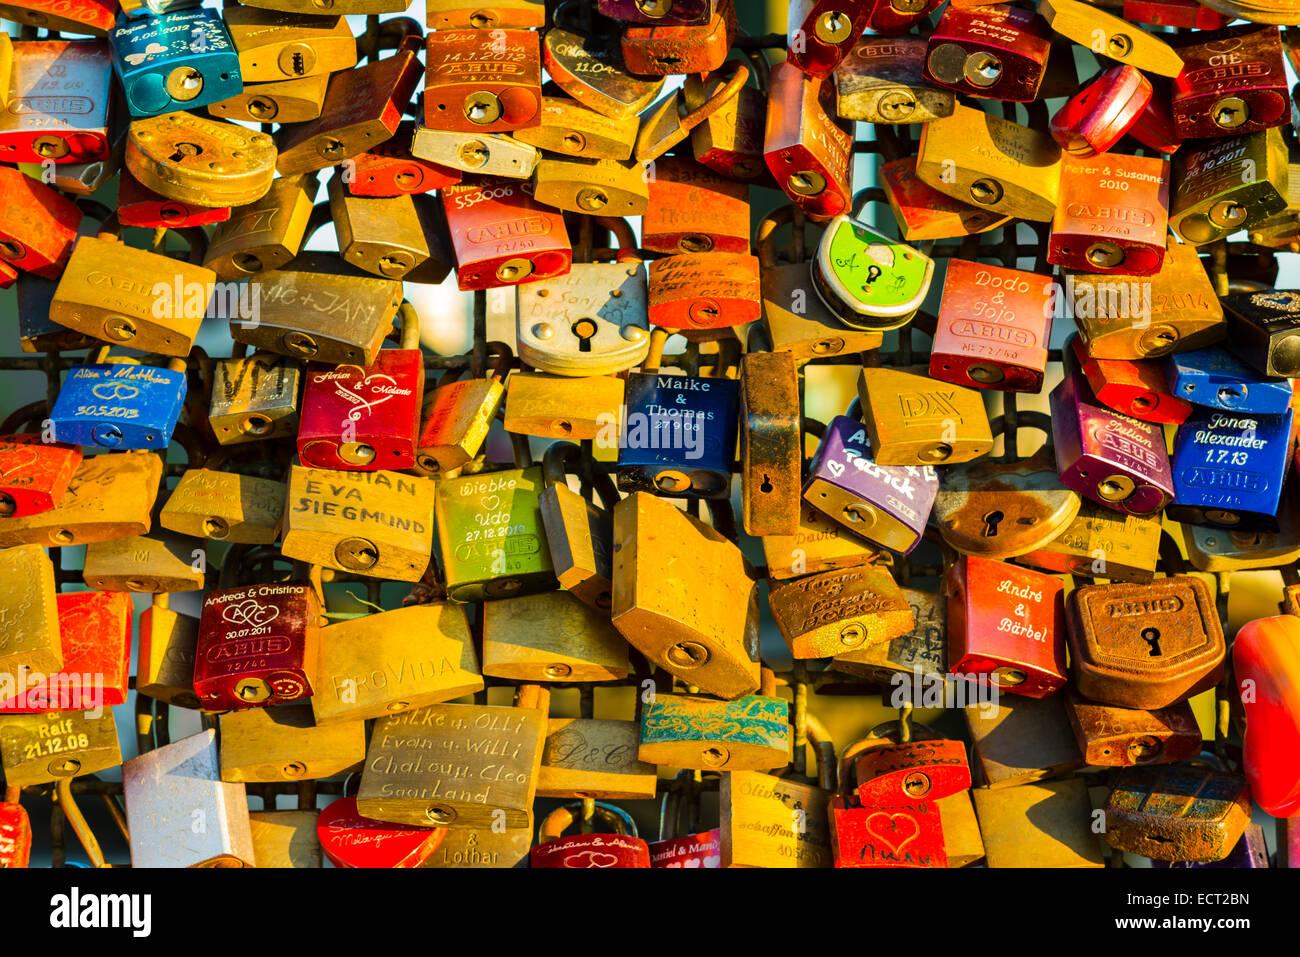 Love locks, symbols of love and loyalty, Hohenzollern Bridge, Cologne, Rhineland, North Rhine-Westphalia, Germany - Stock Image